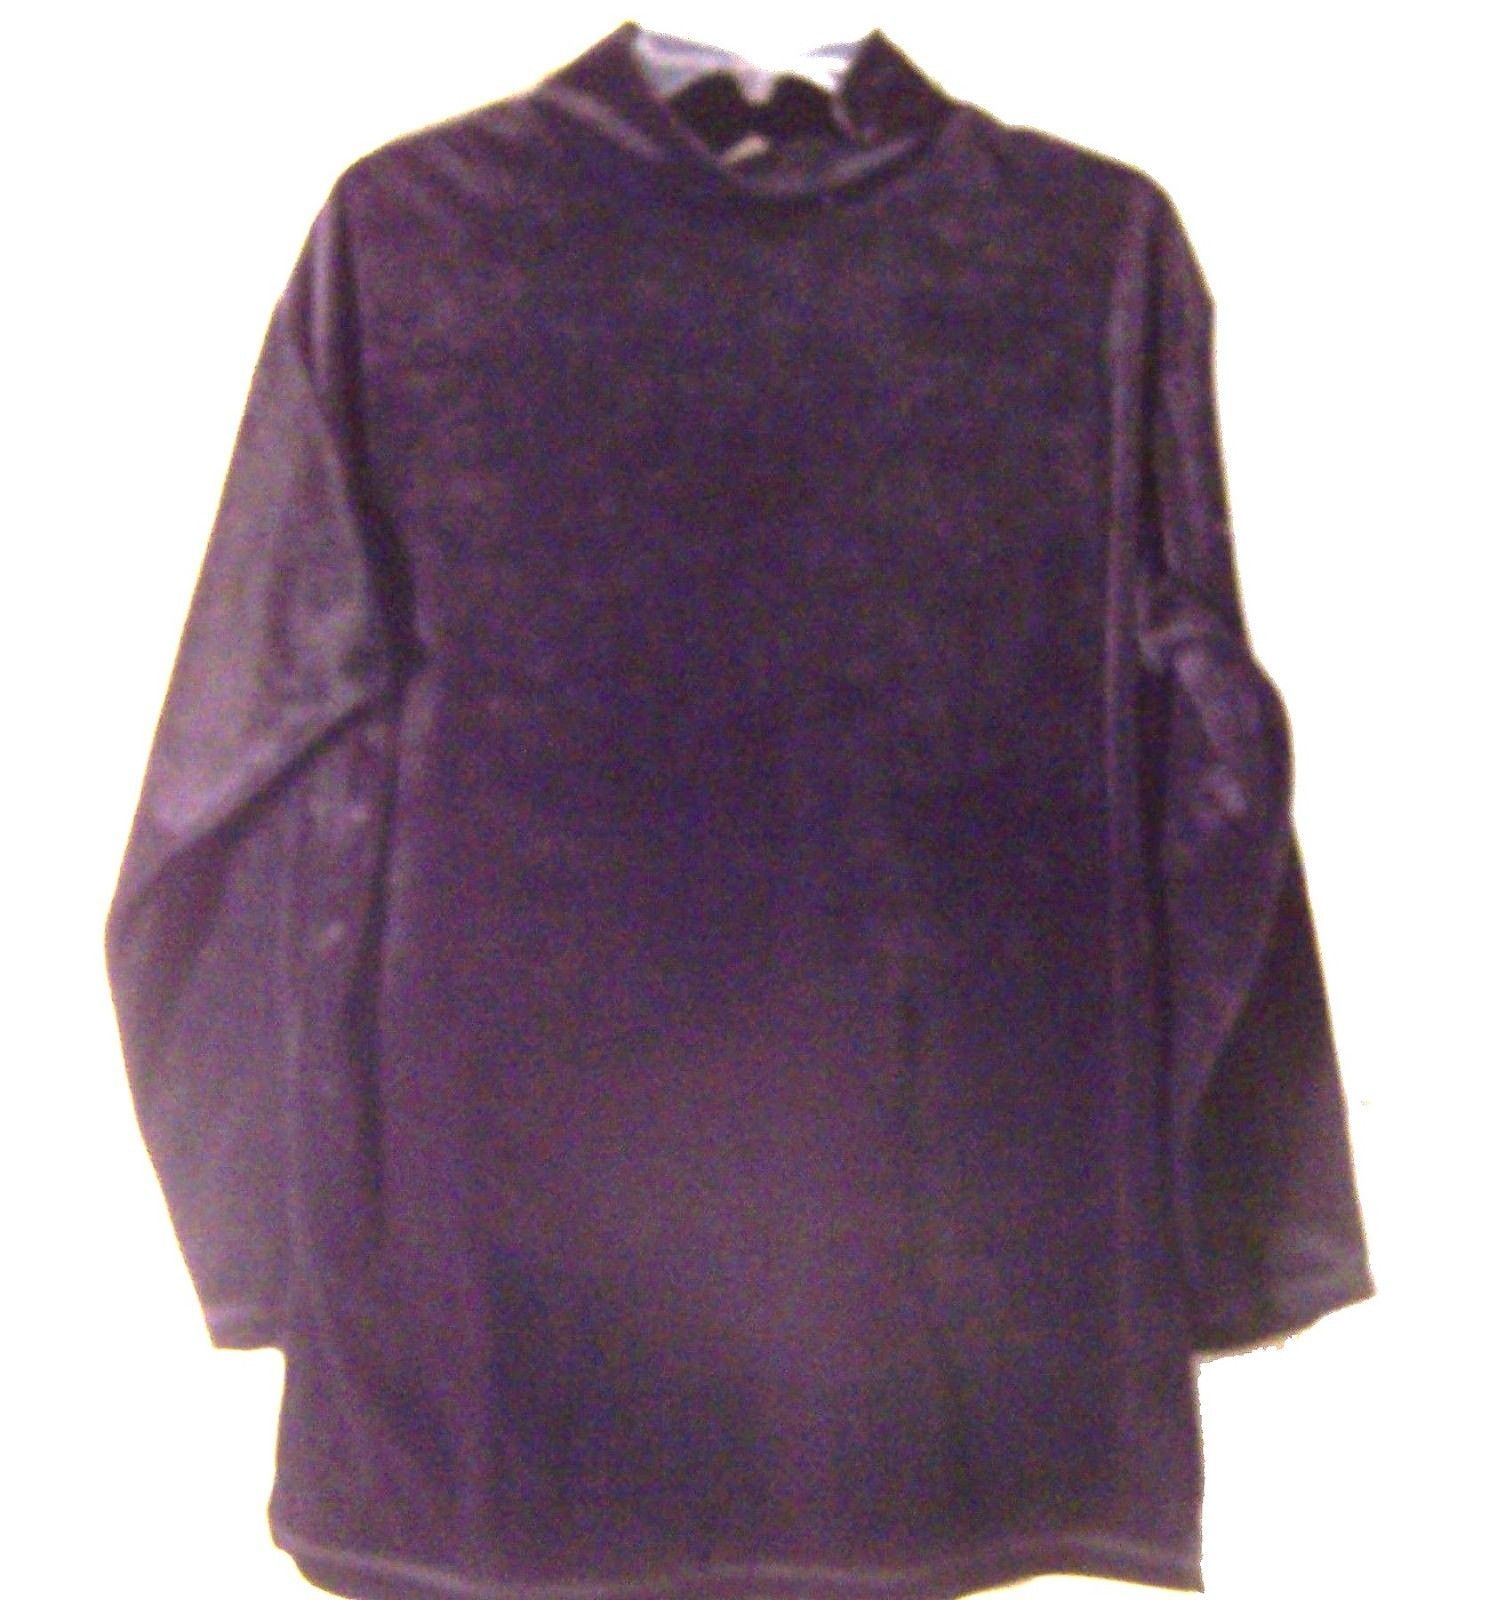 05def507451 Sz L - NWOT Gilligan & O'Malley Velvet Hi Neck Long Sleeve Top Sz Small -  $25.64